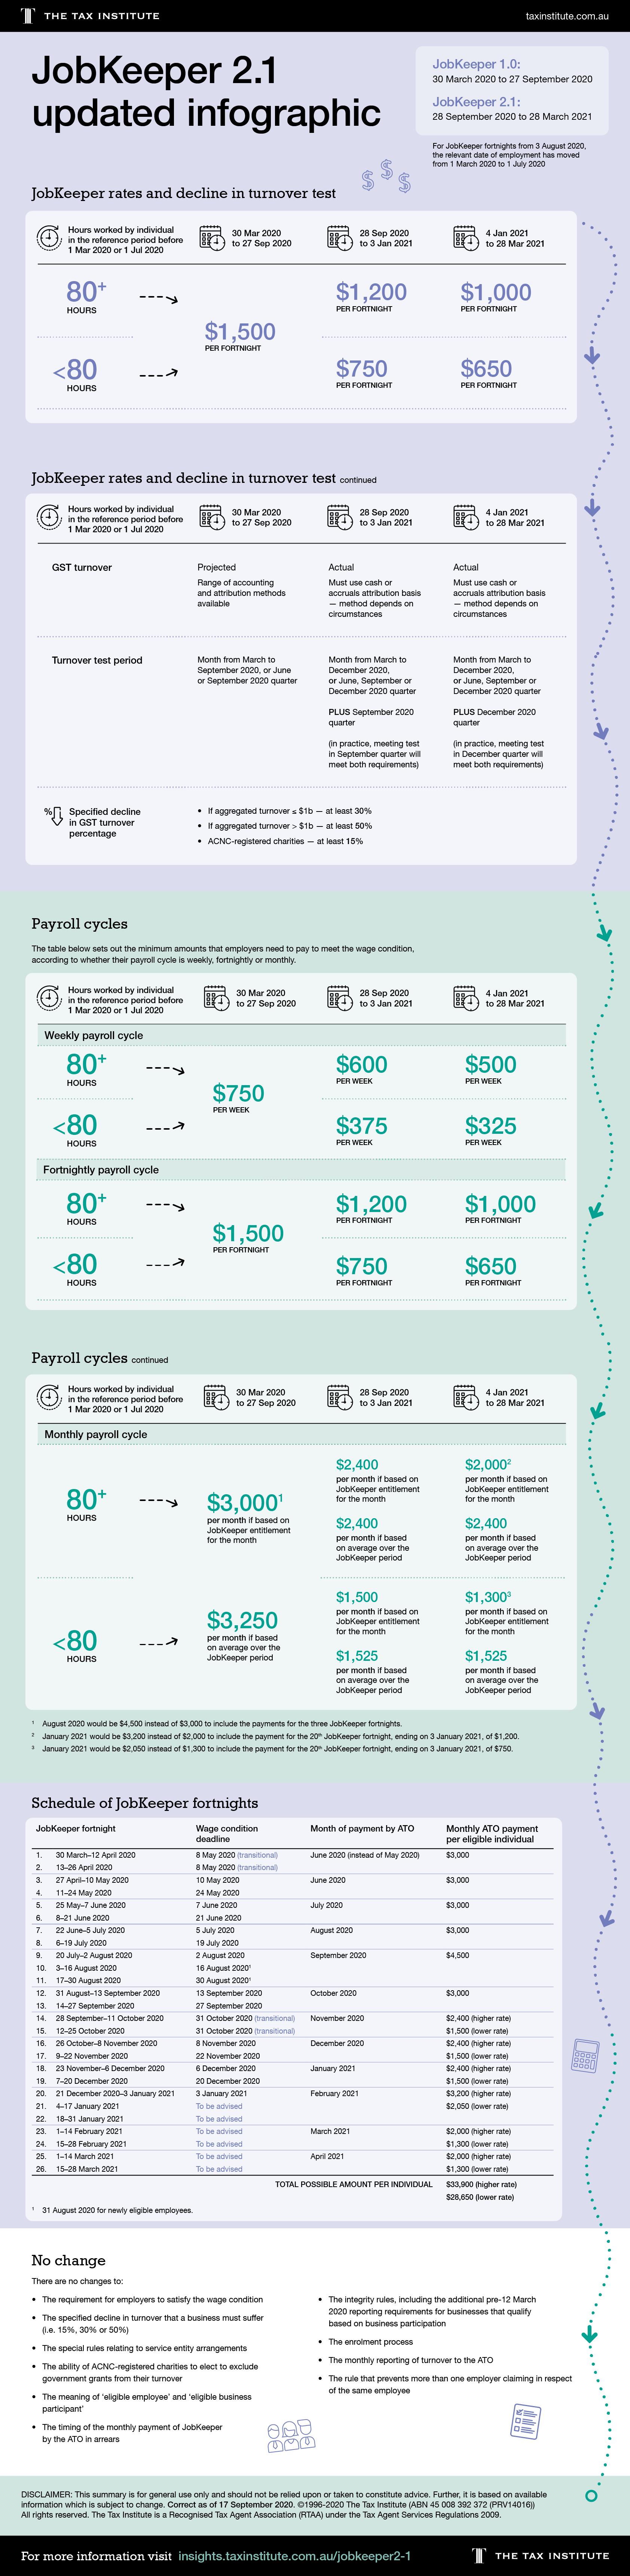 0100TTI_JobKeeper_2.1_Infographic_assets_v8-Blog